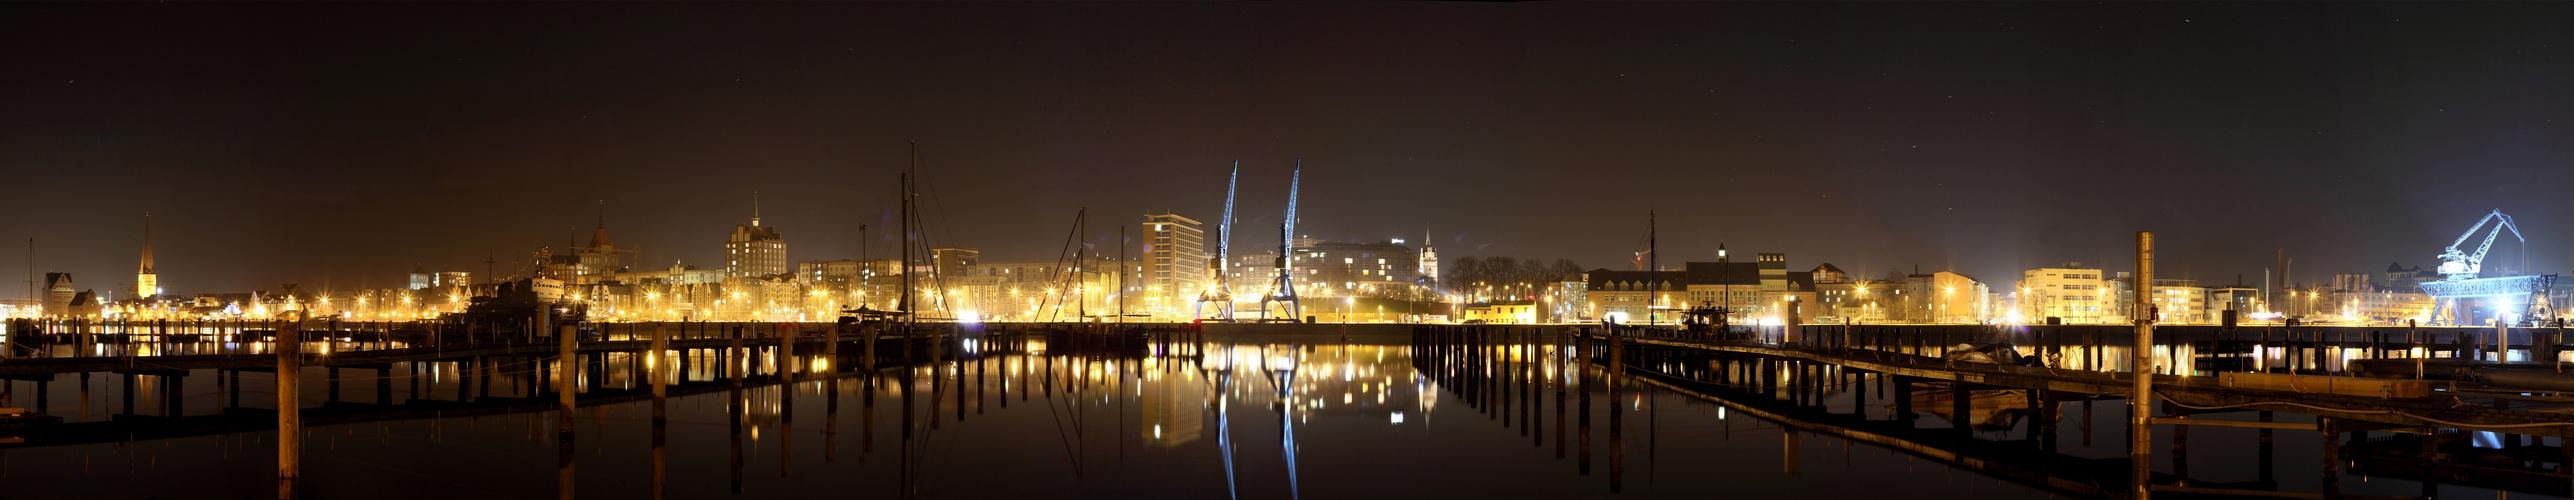 Rostock Panorama bei Nacht